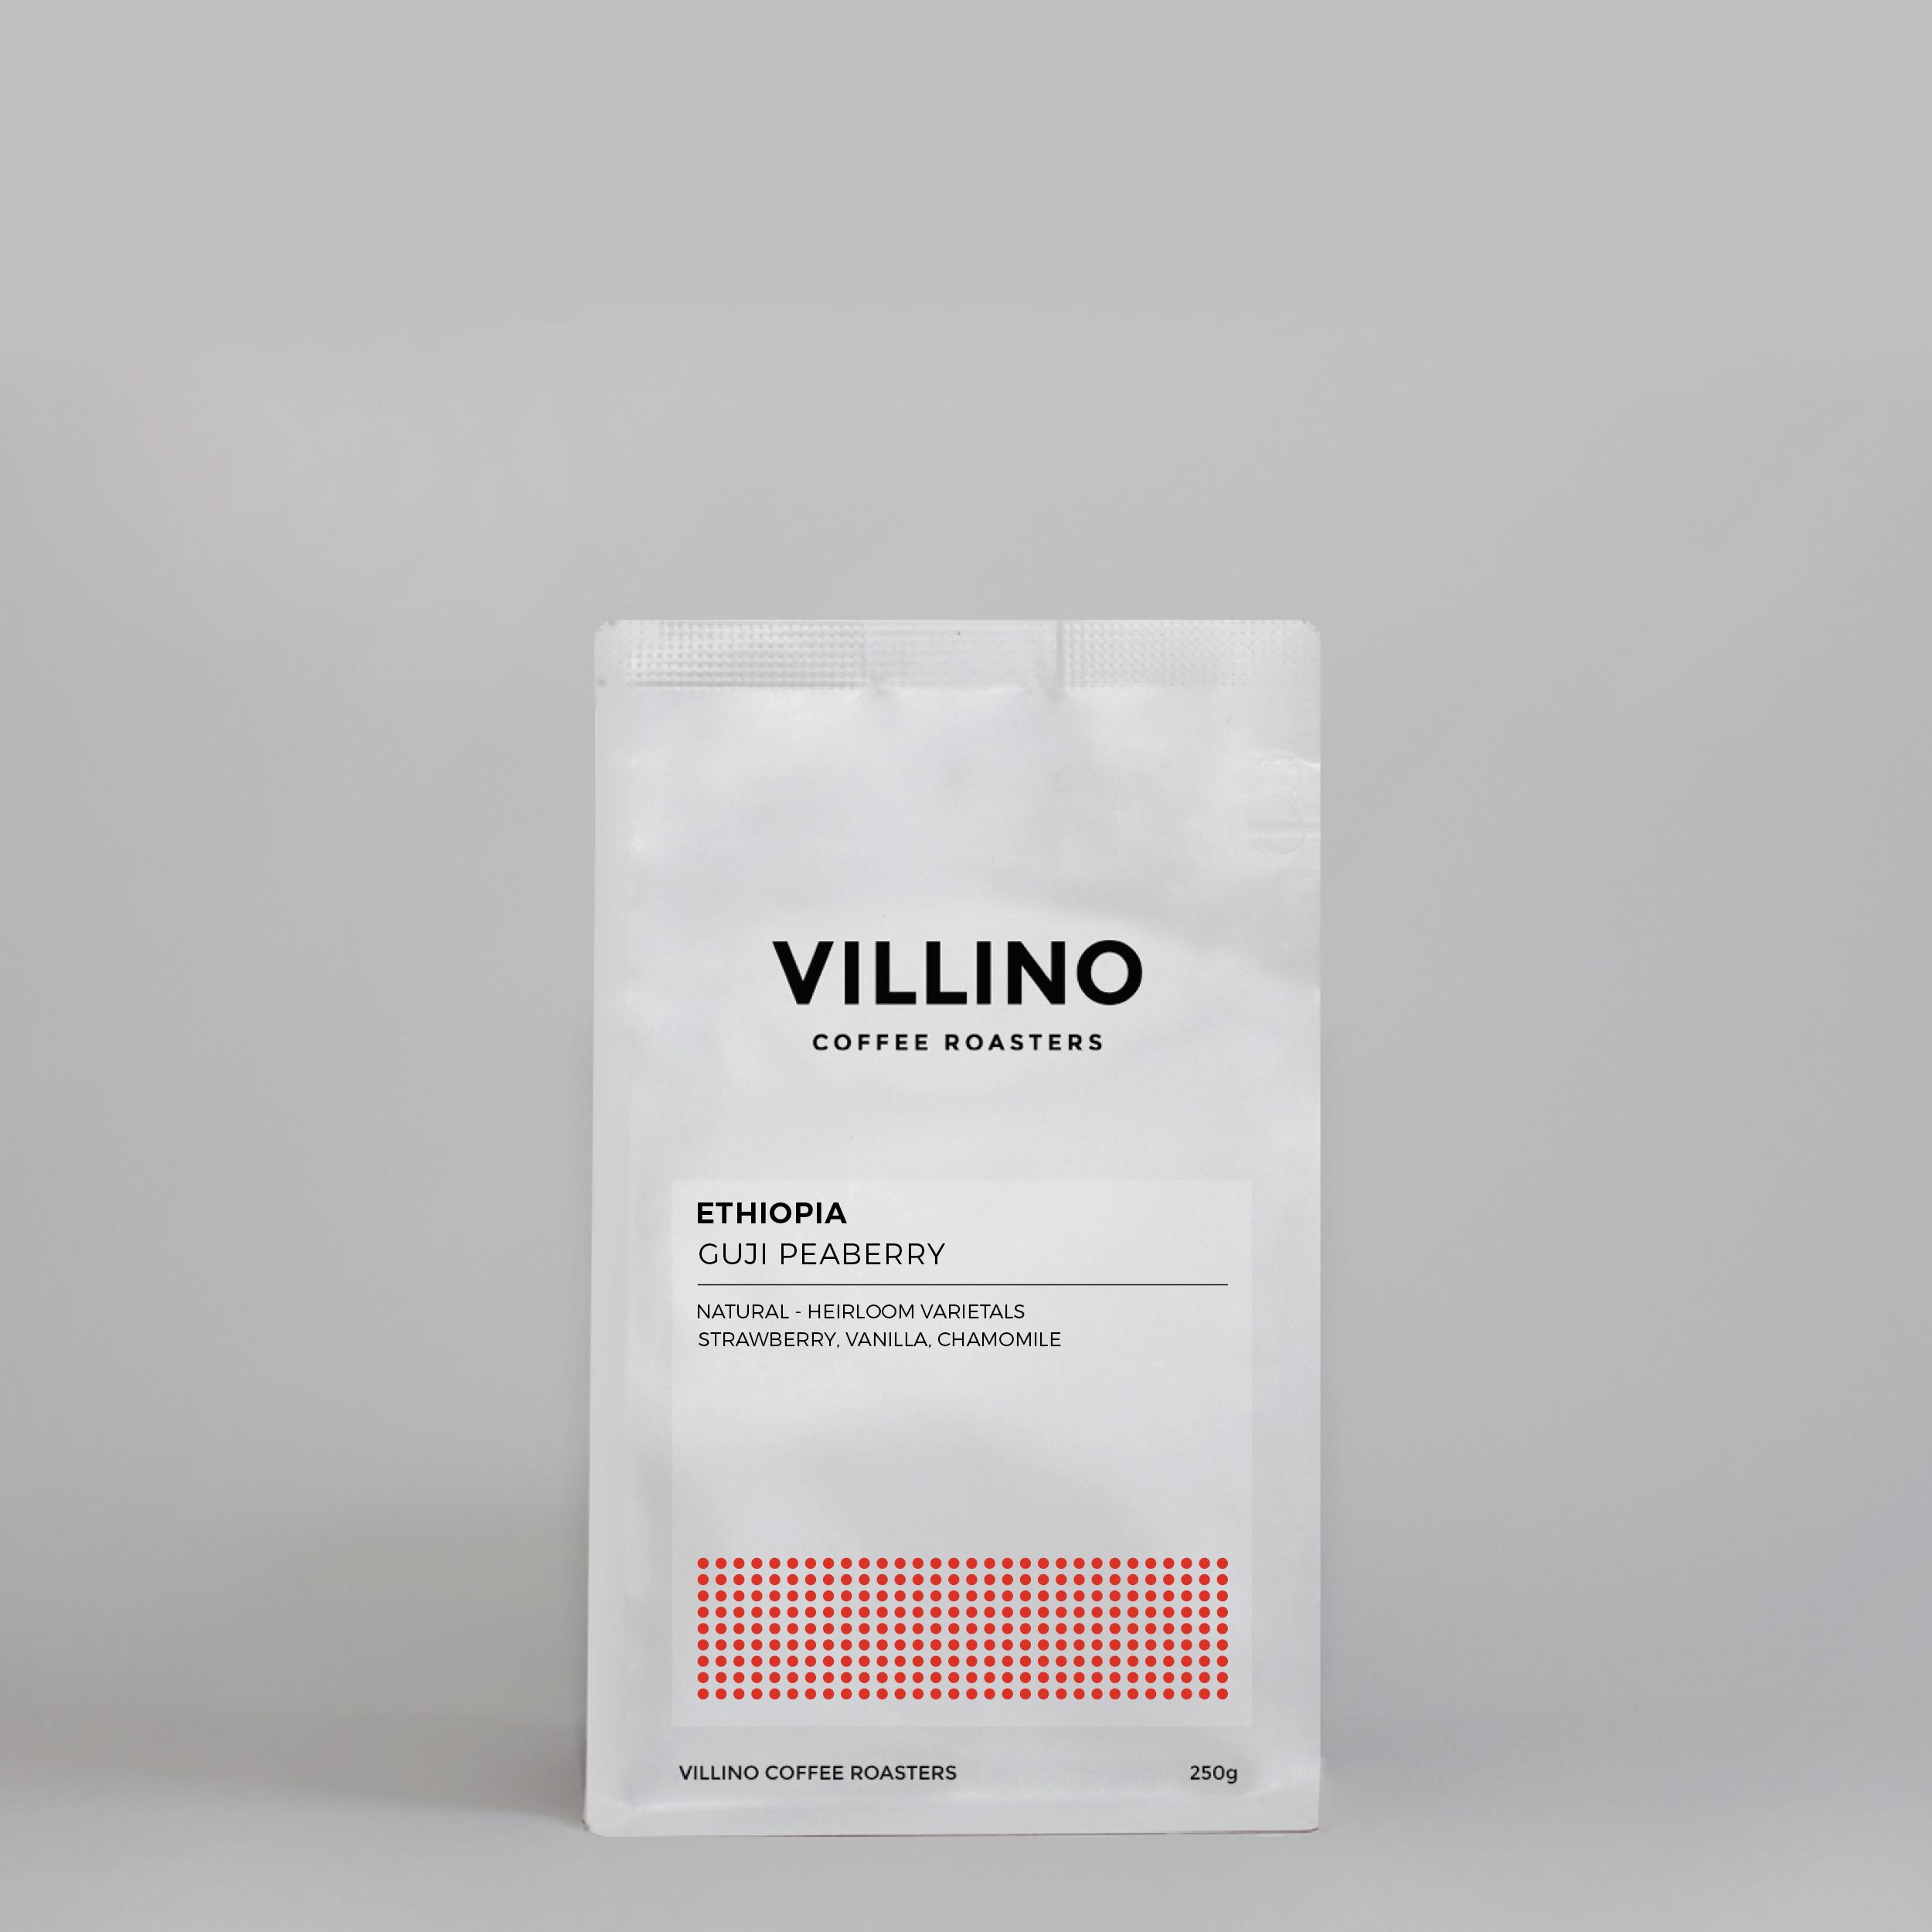 Villino_Retail Bag Guji Peaberry_600x600px.png